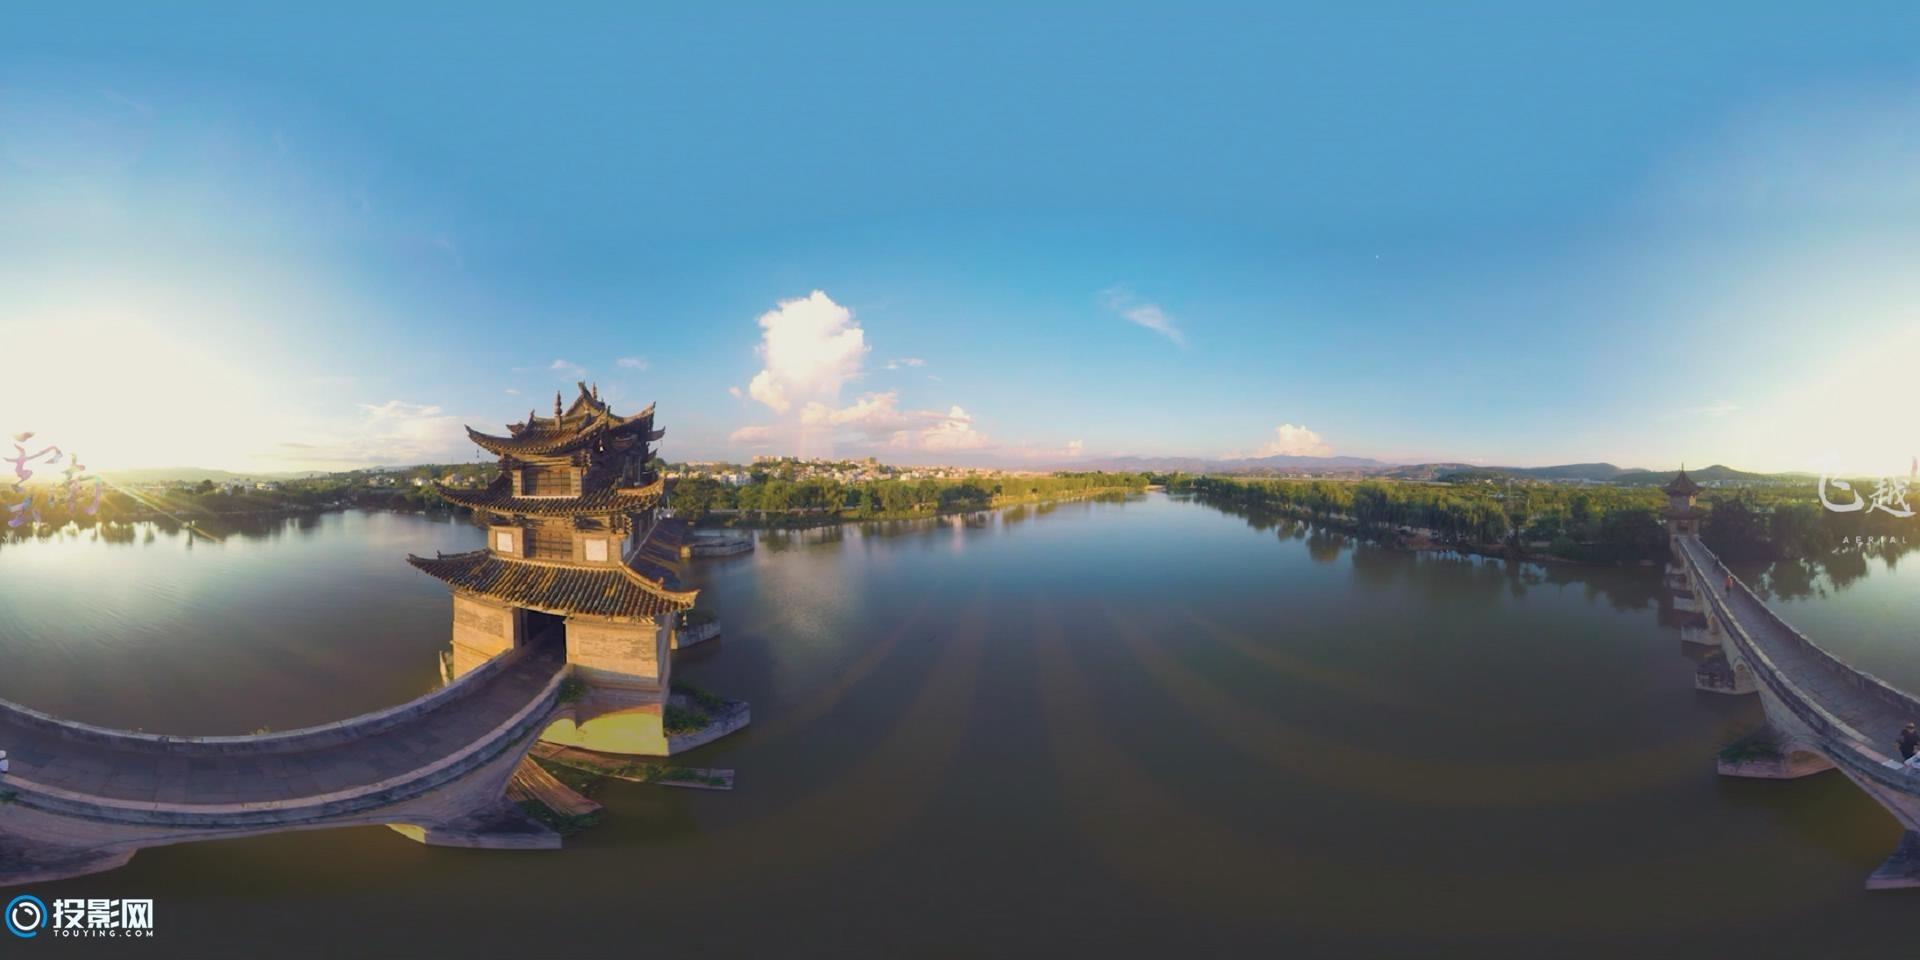 [VR360°全景] 飞越云南:建水·十七孔桥 [1080P/MP4/70MB]